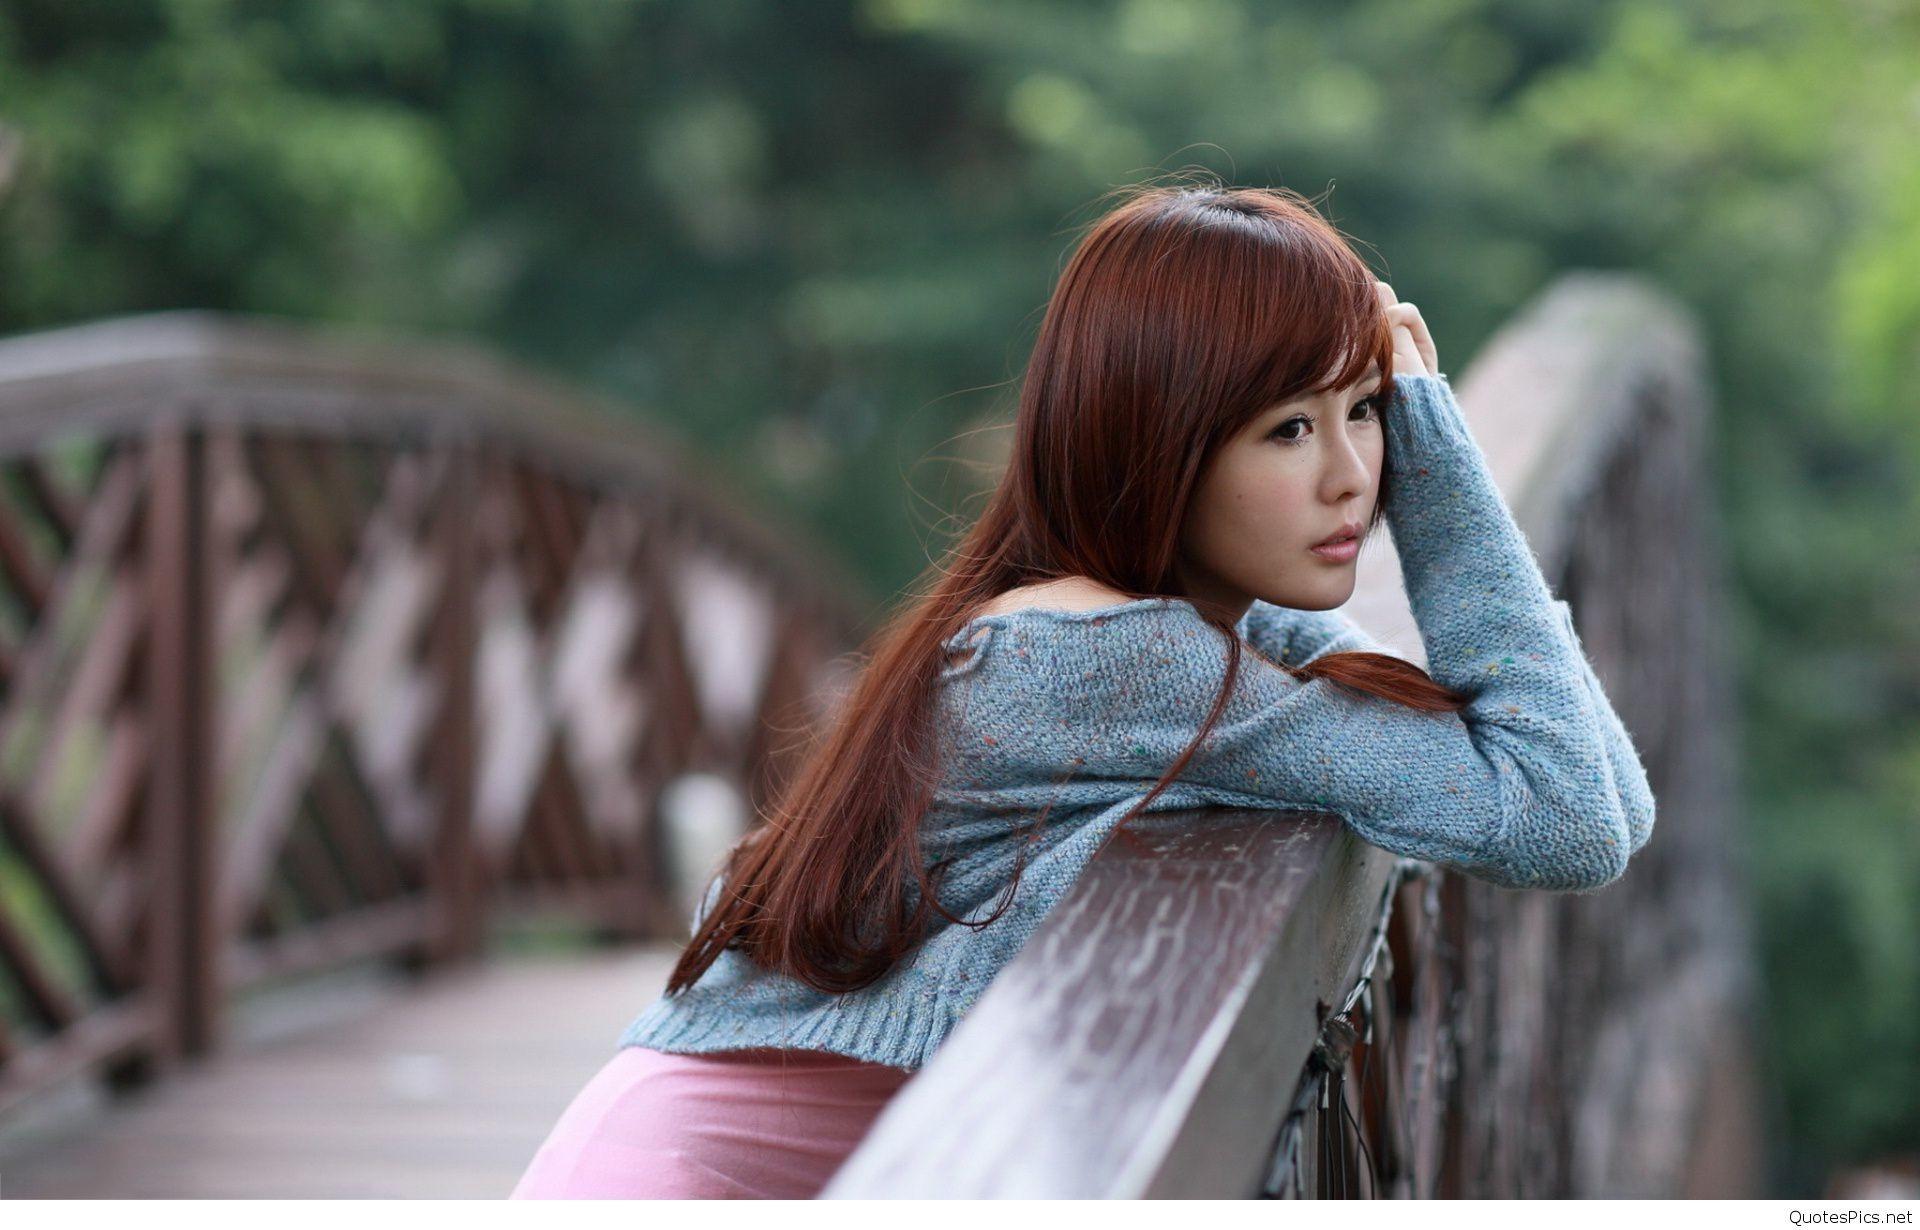 Sad Lonely Girl Wallpaper   Src Sad Girl Wallpapers - Cute Alone Girl Hd - HD Wallpaper